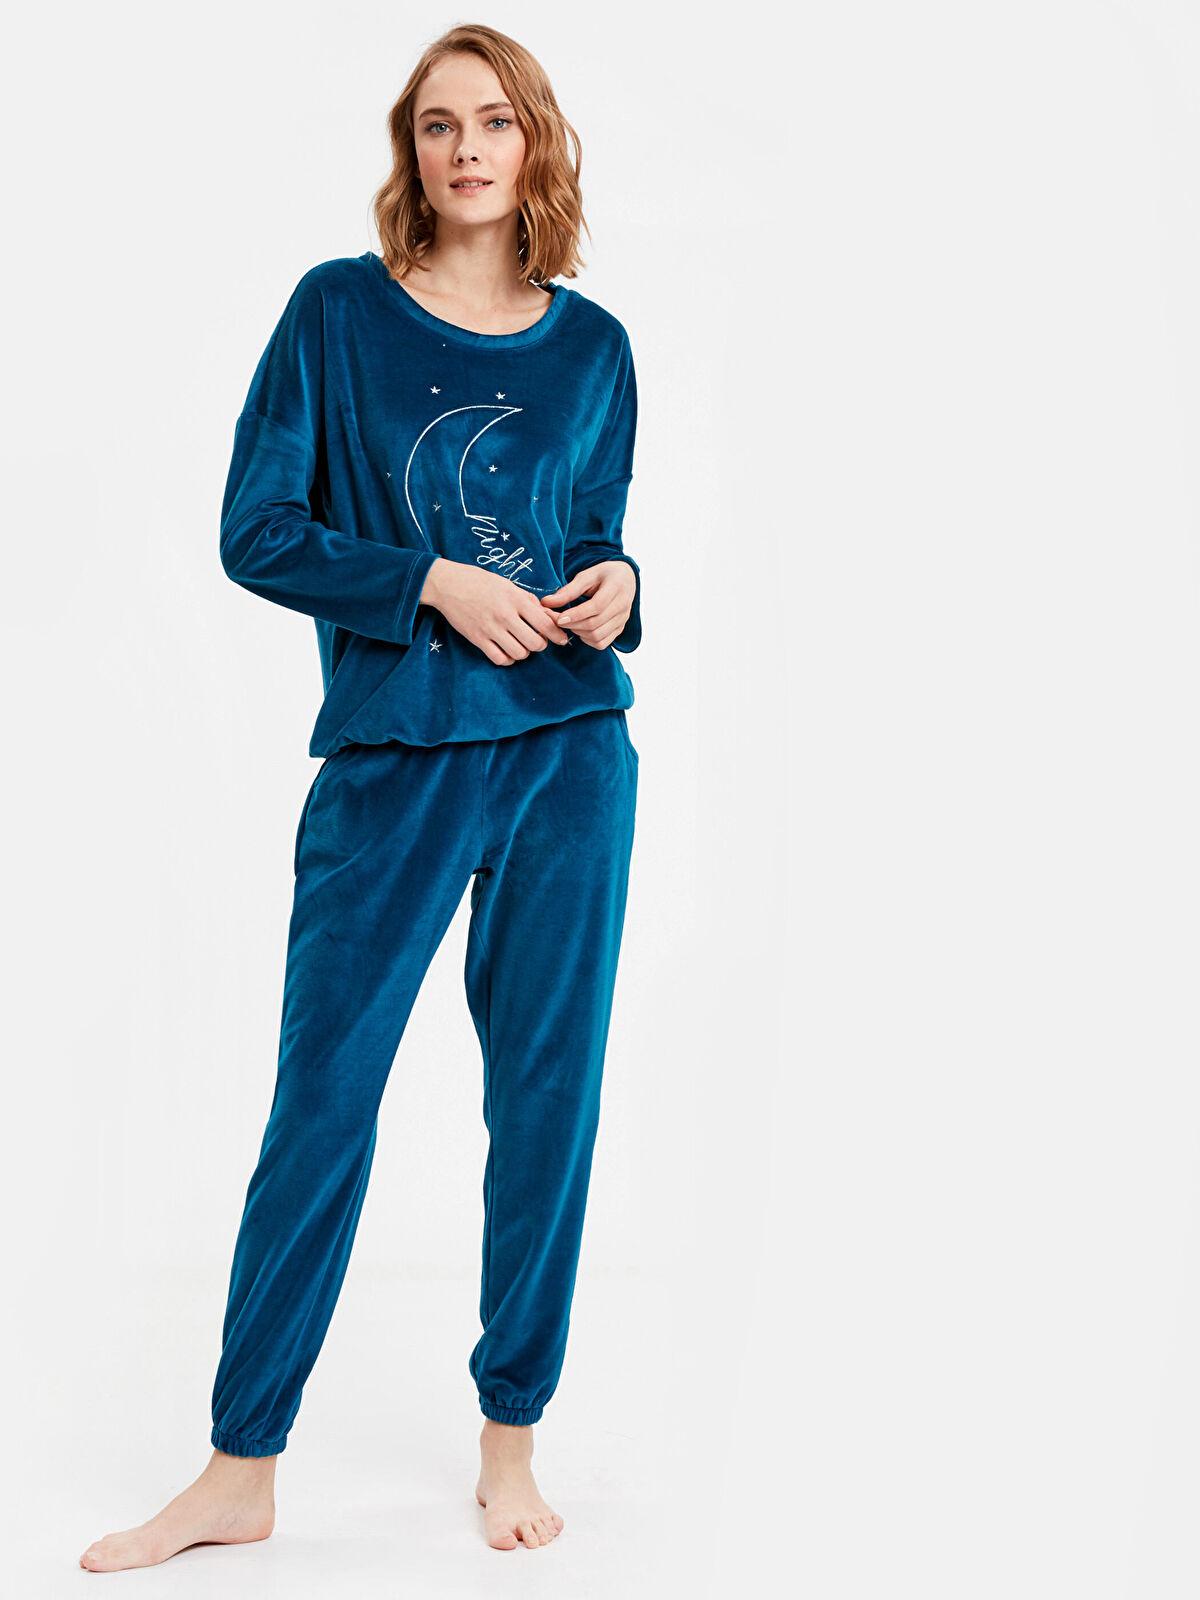 Kadife Pijama Takımı - LC WAIKIKI